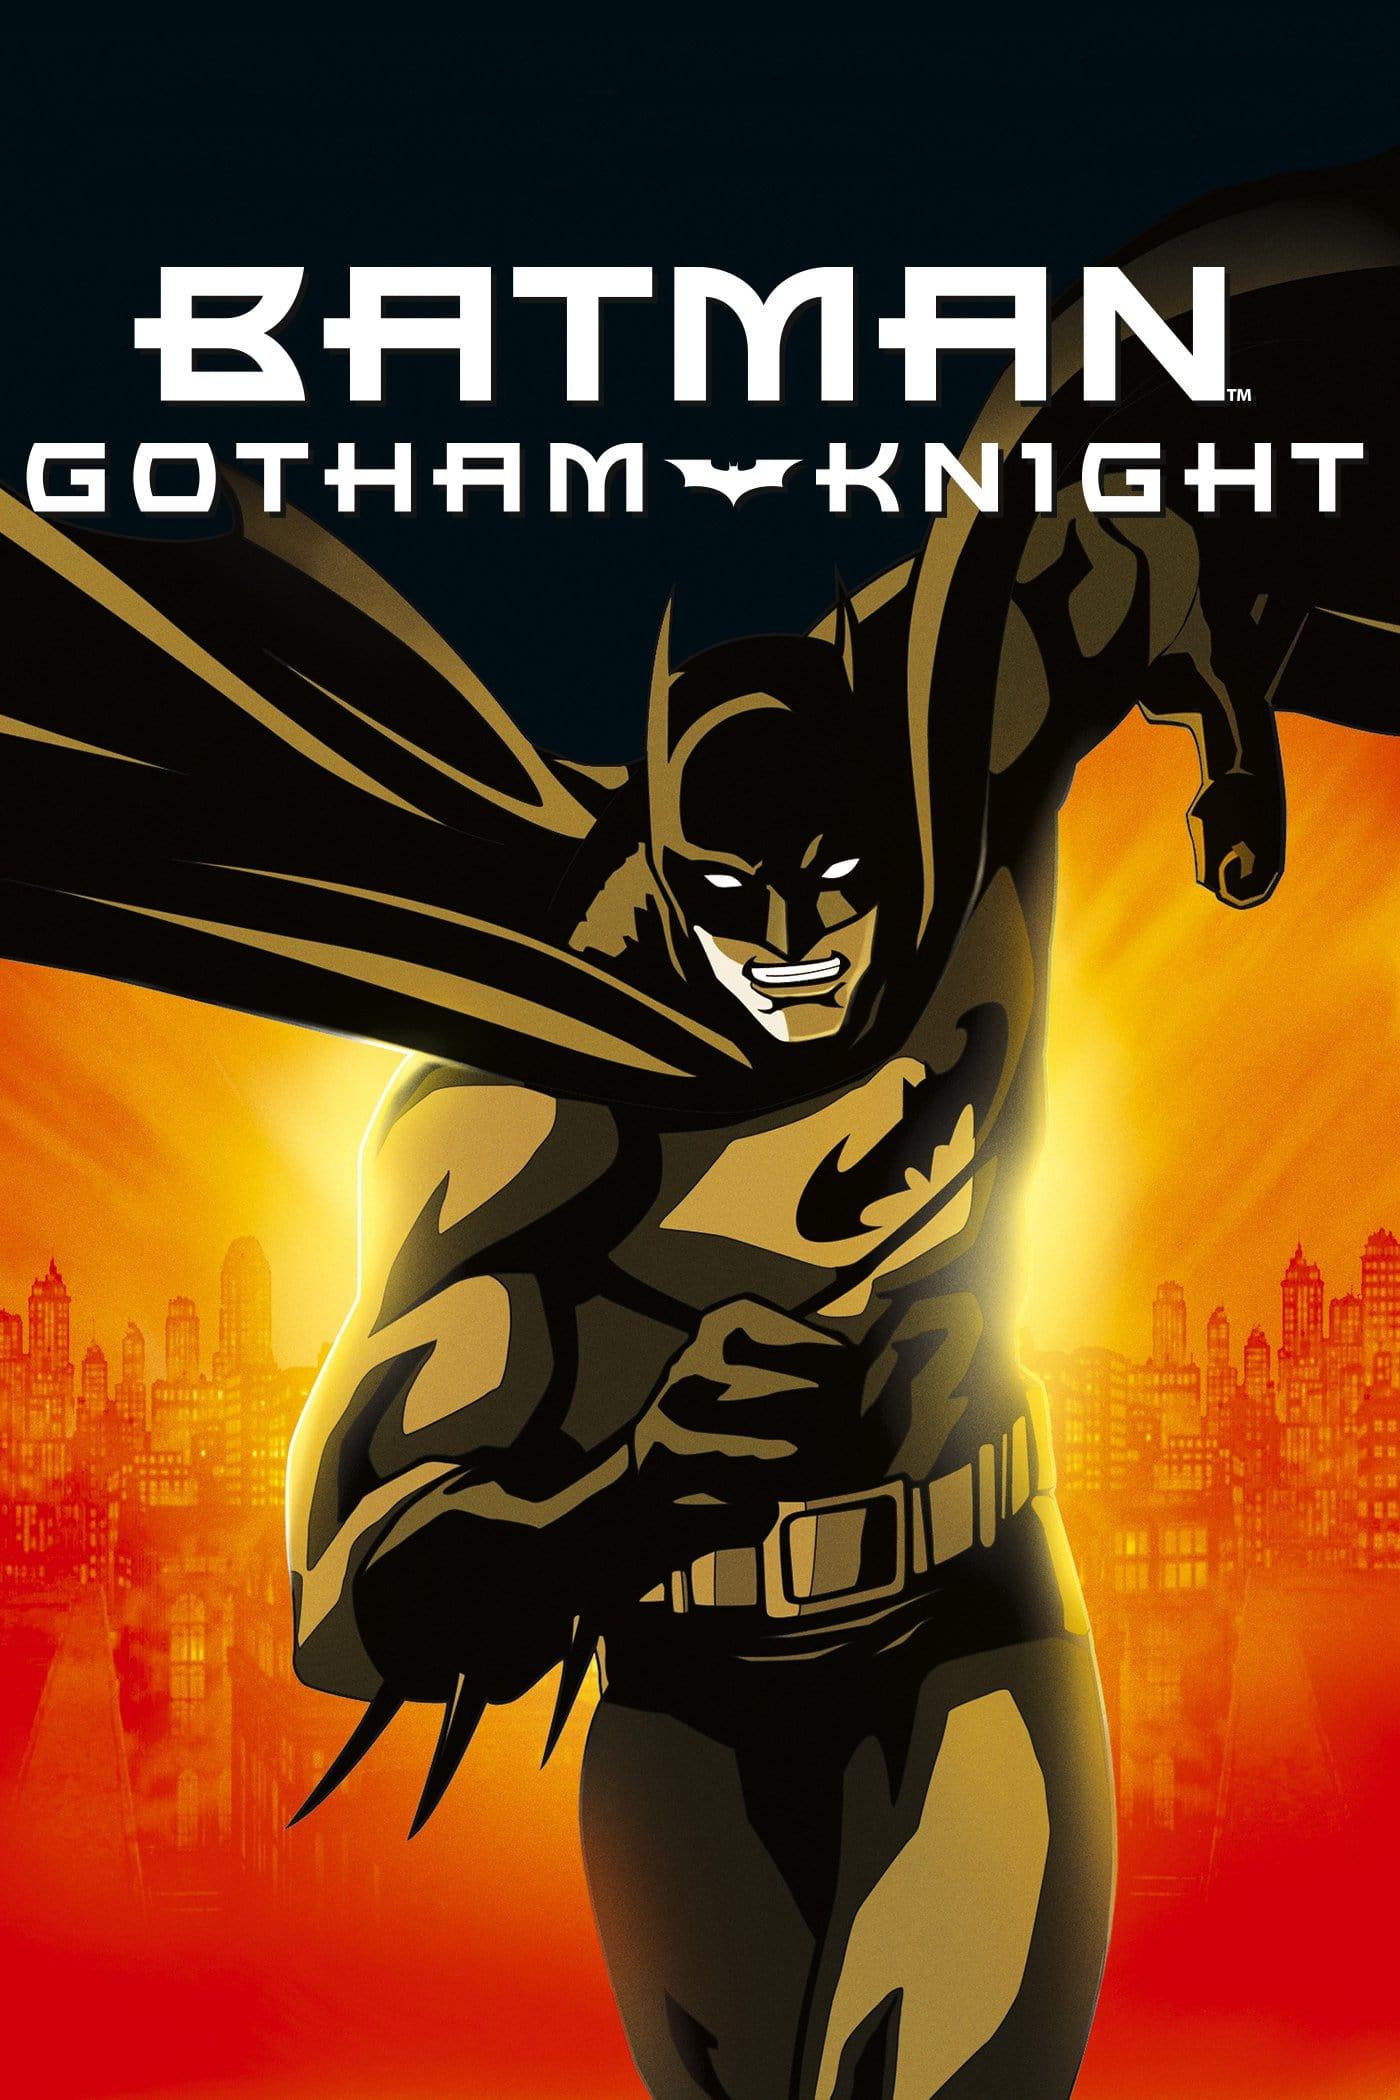 Regarder Batman: Gotham Knight en streaming gratuit